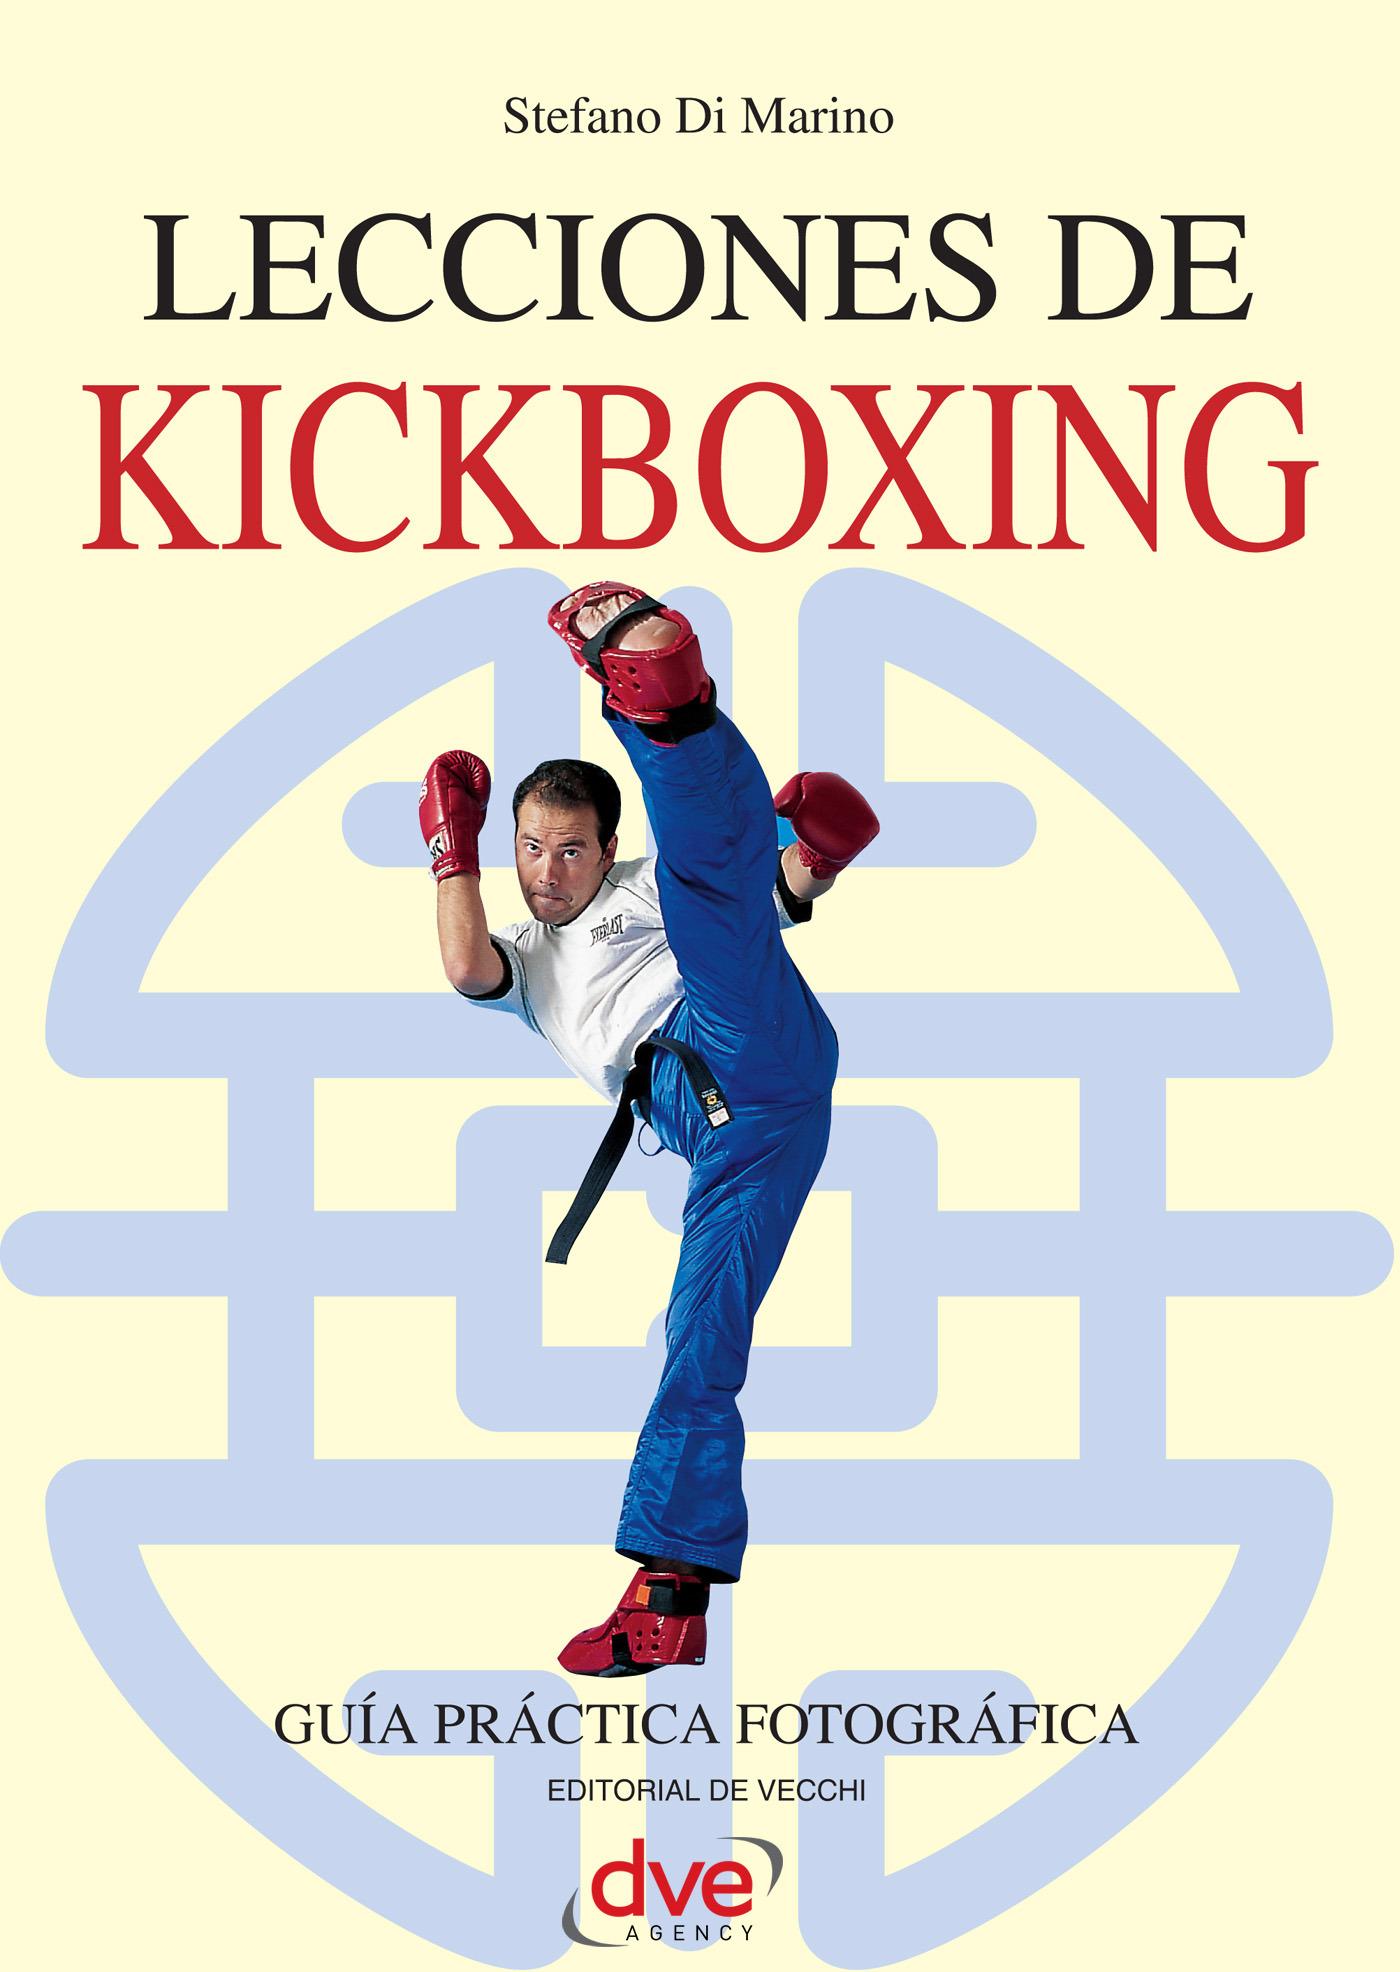 Marino, Stefano Di - Lecciones de kickboxing, ebook